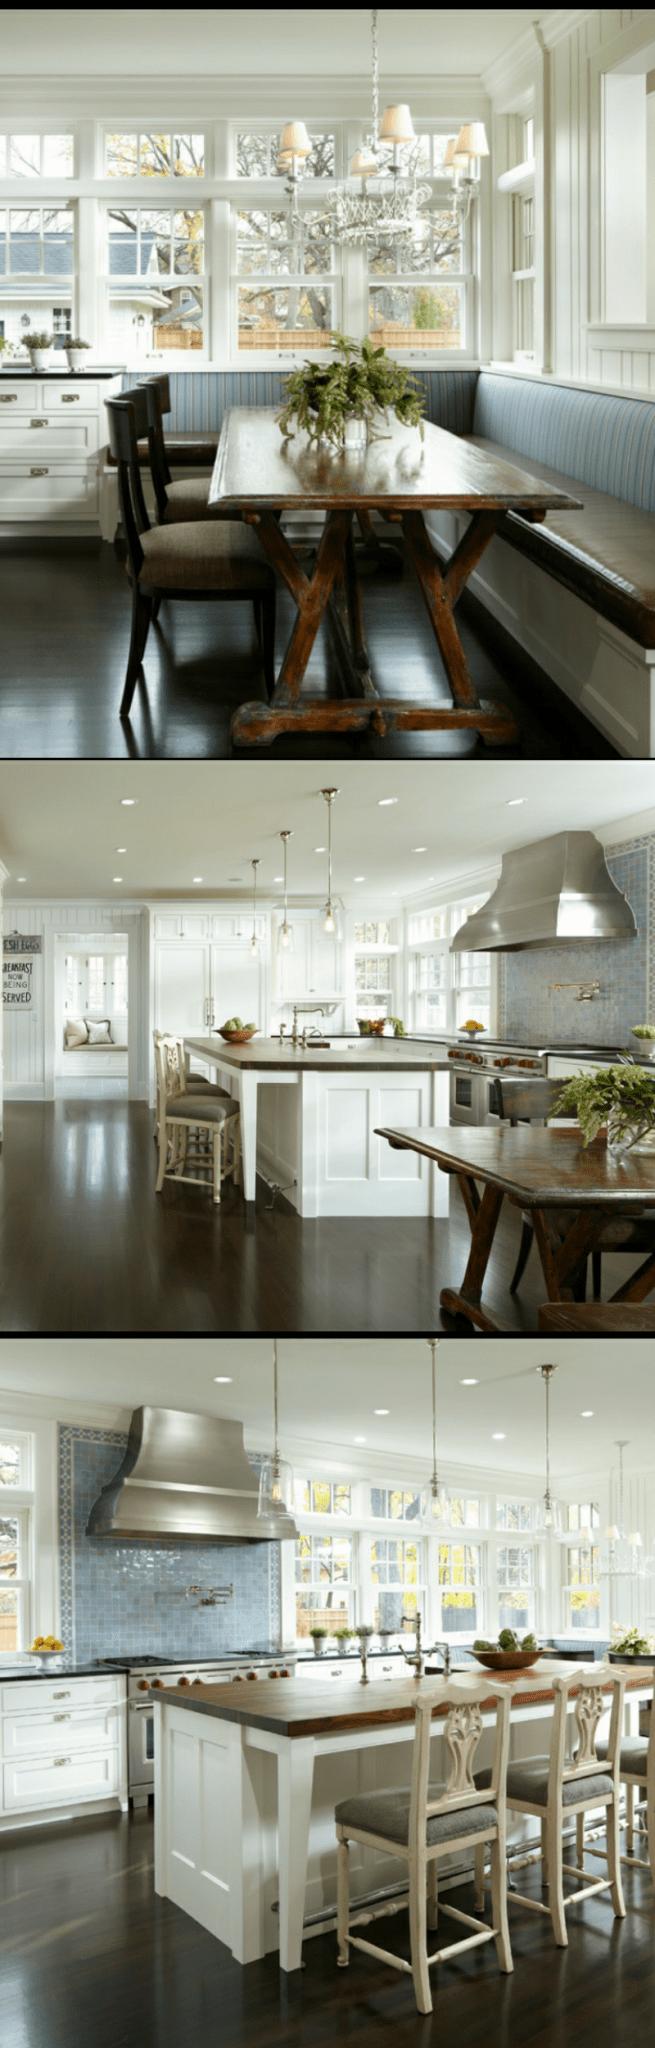 modern eatin kitchen ideas ideas of decoration and